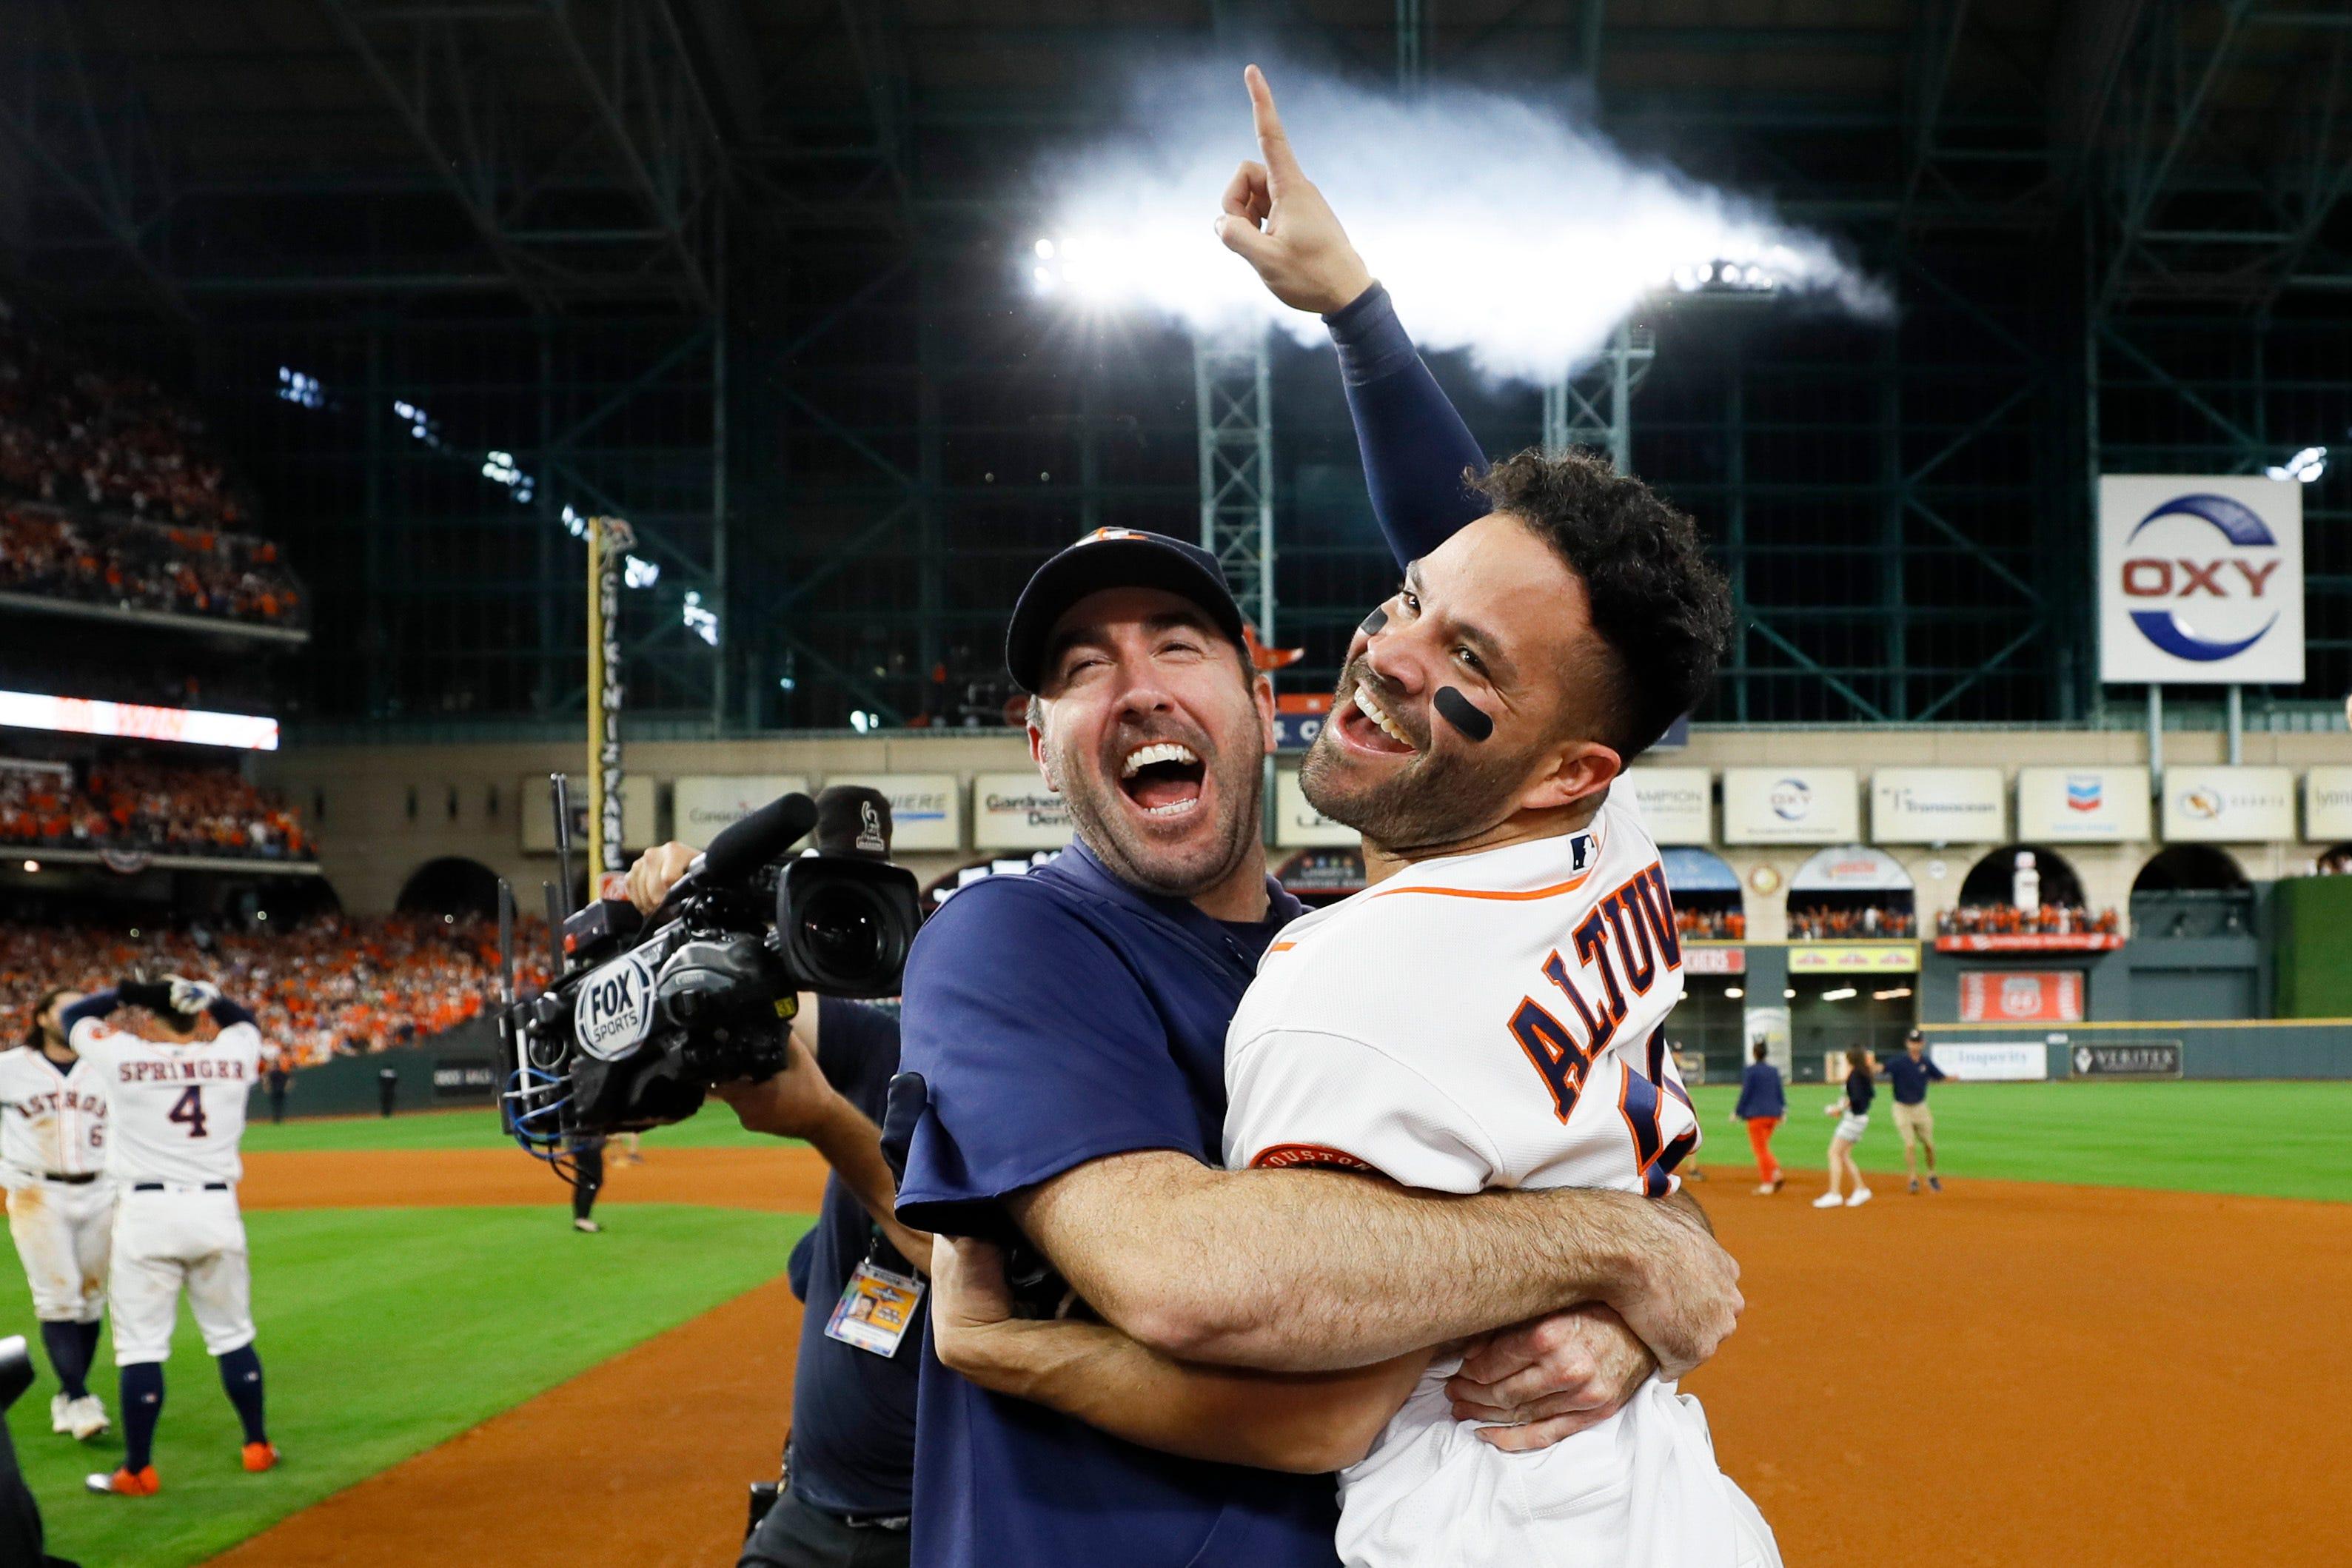 MLB playoffs: Jose Altuve, Astros finish Yankees to reach World Series